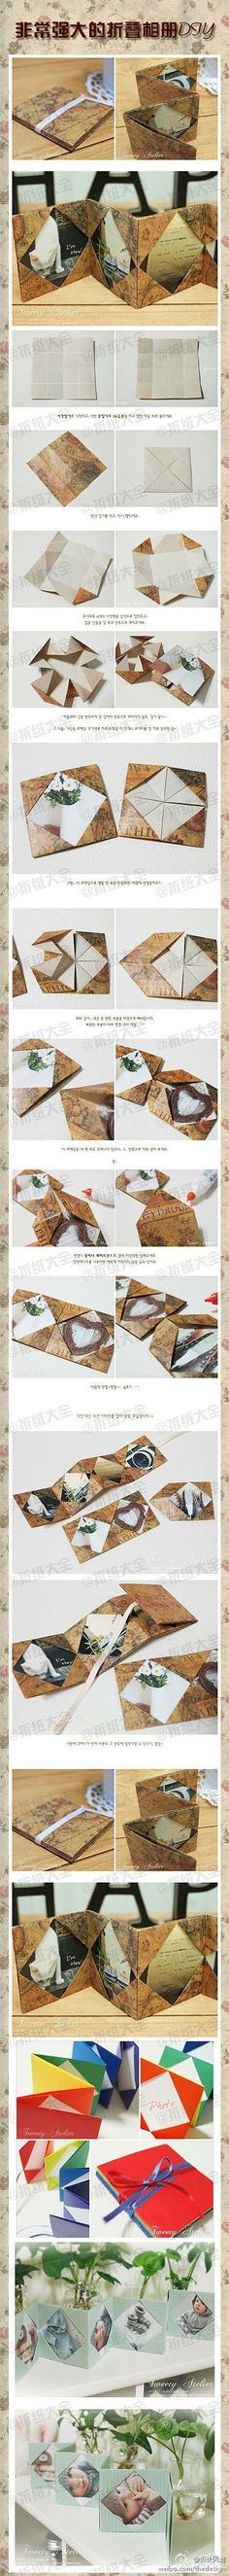 Origami photo frame book tutorial